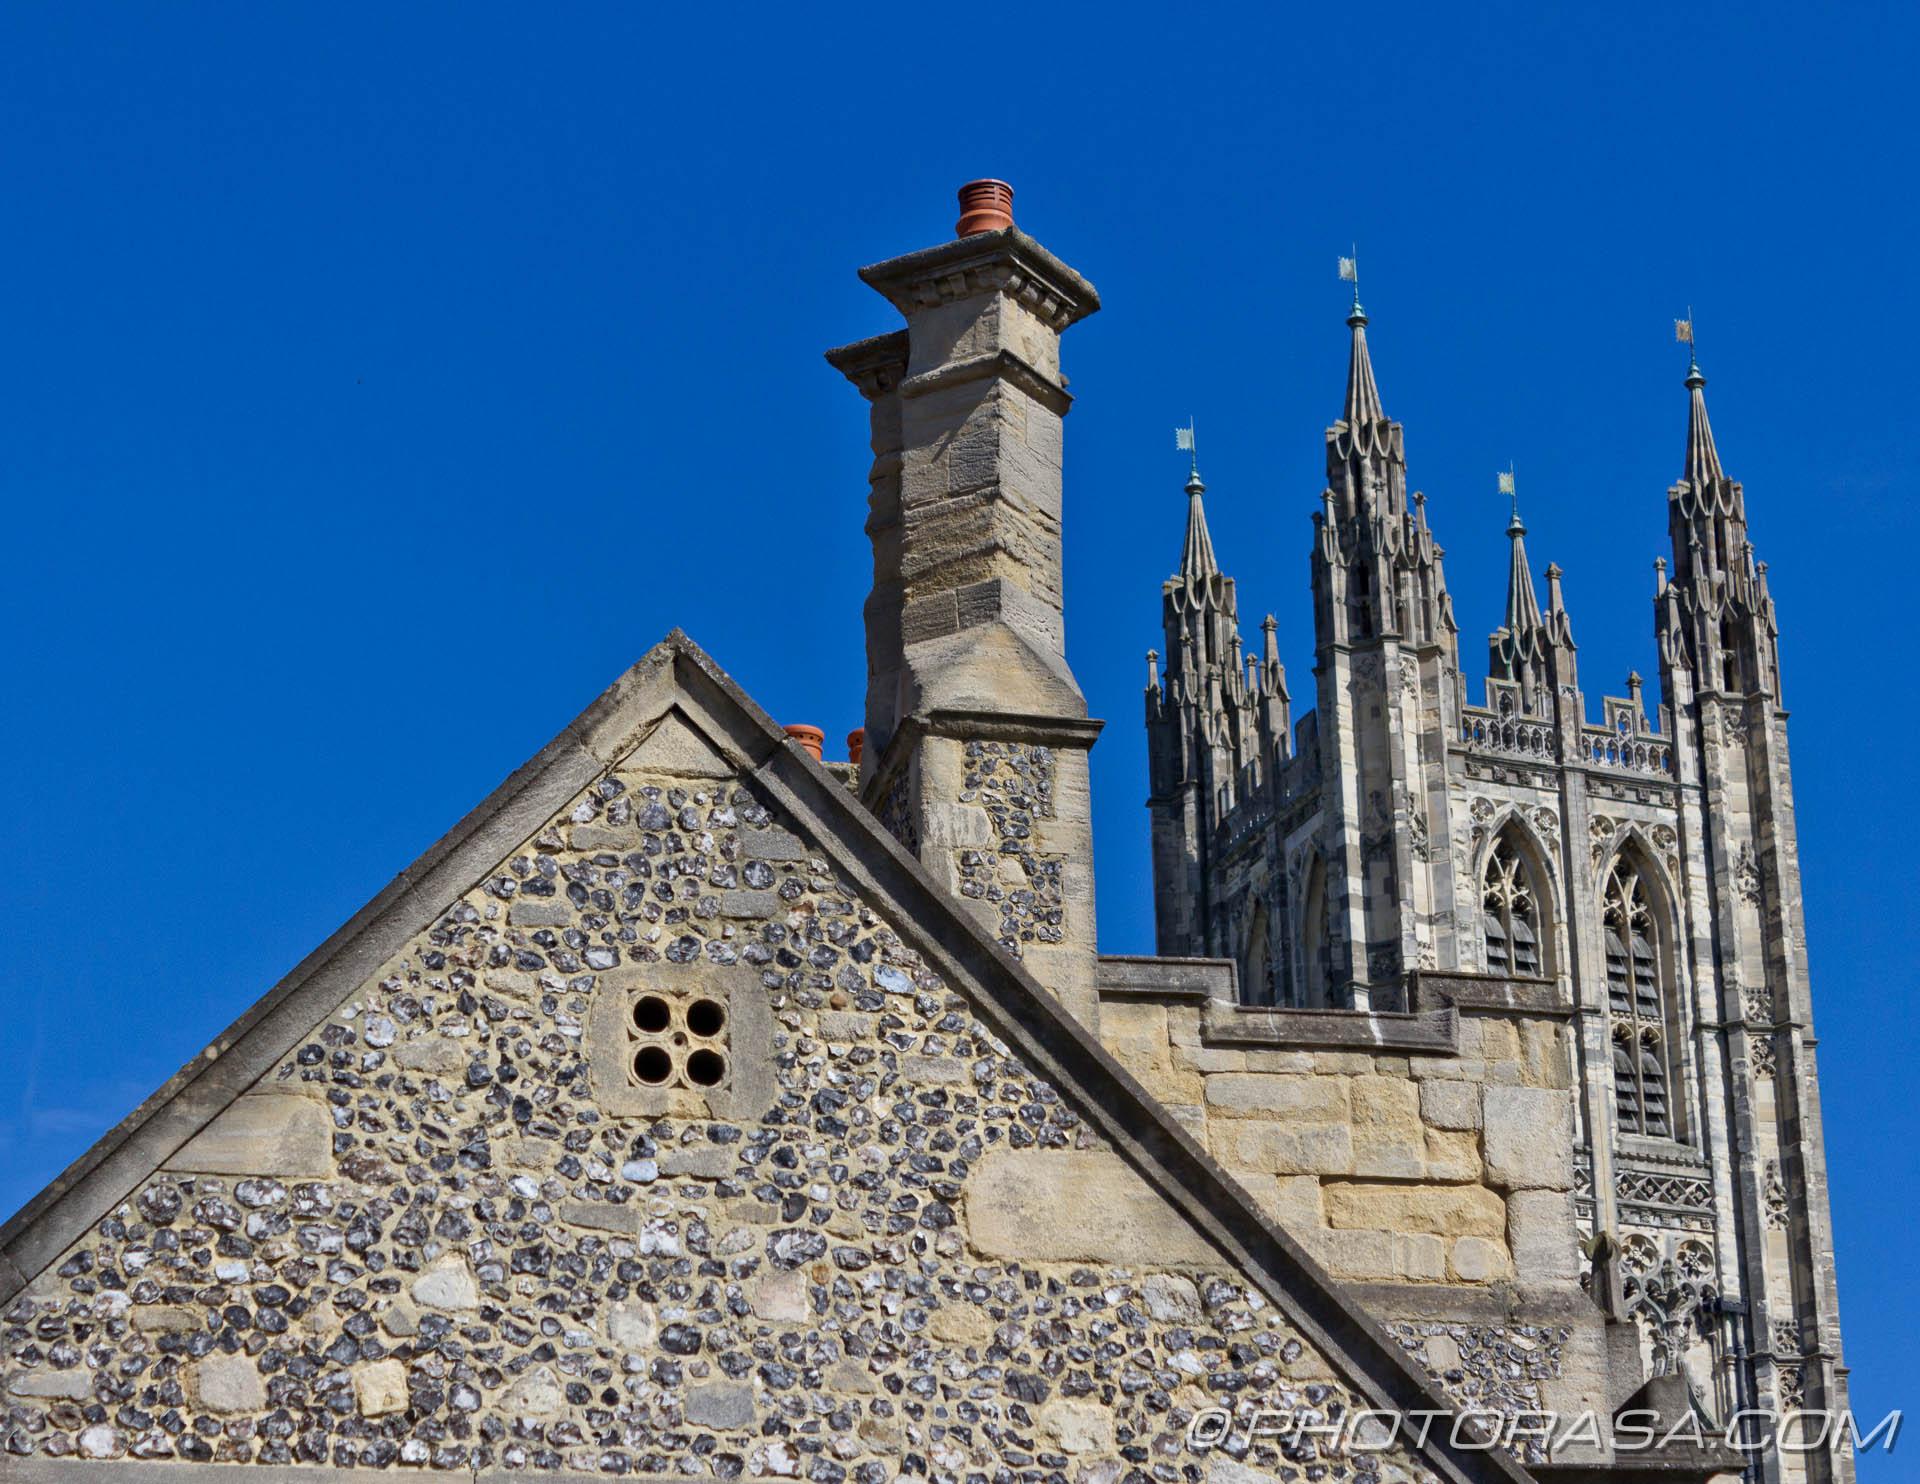 http://photorasa.com/canterbury-trip/canterbury-rooftops/